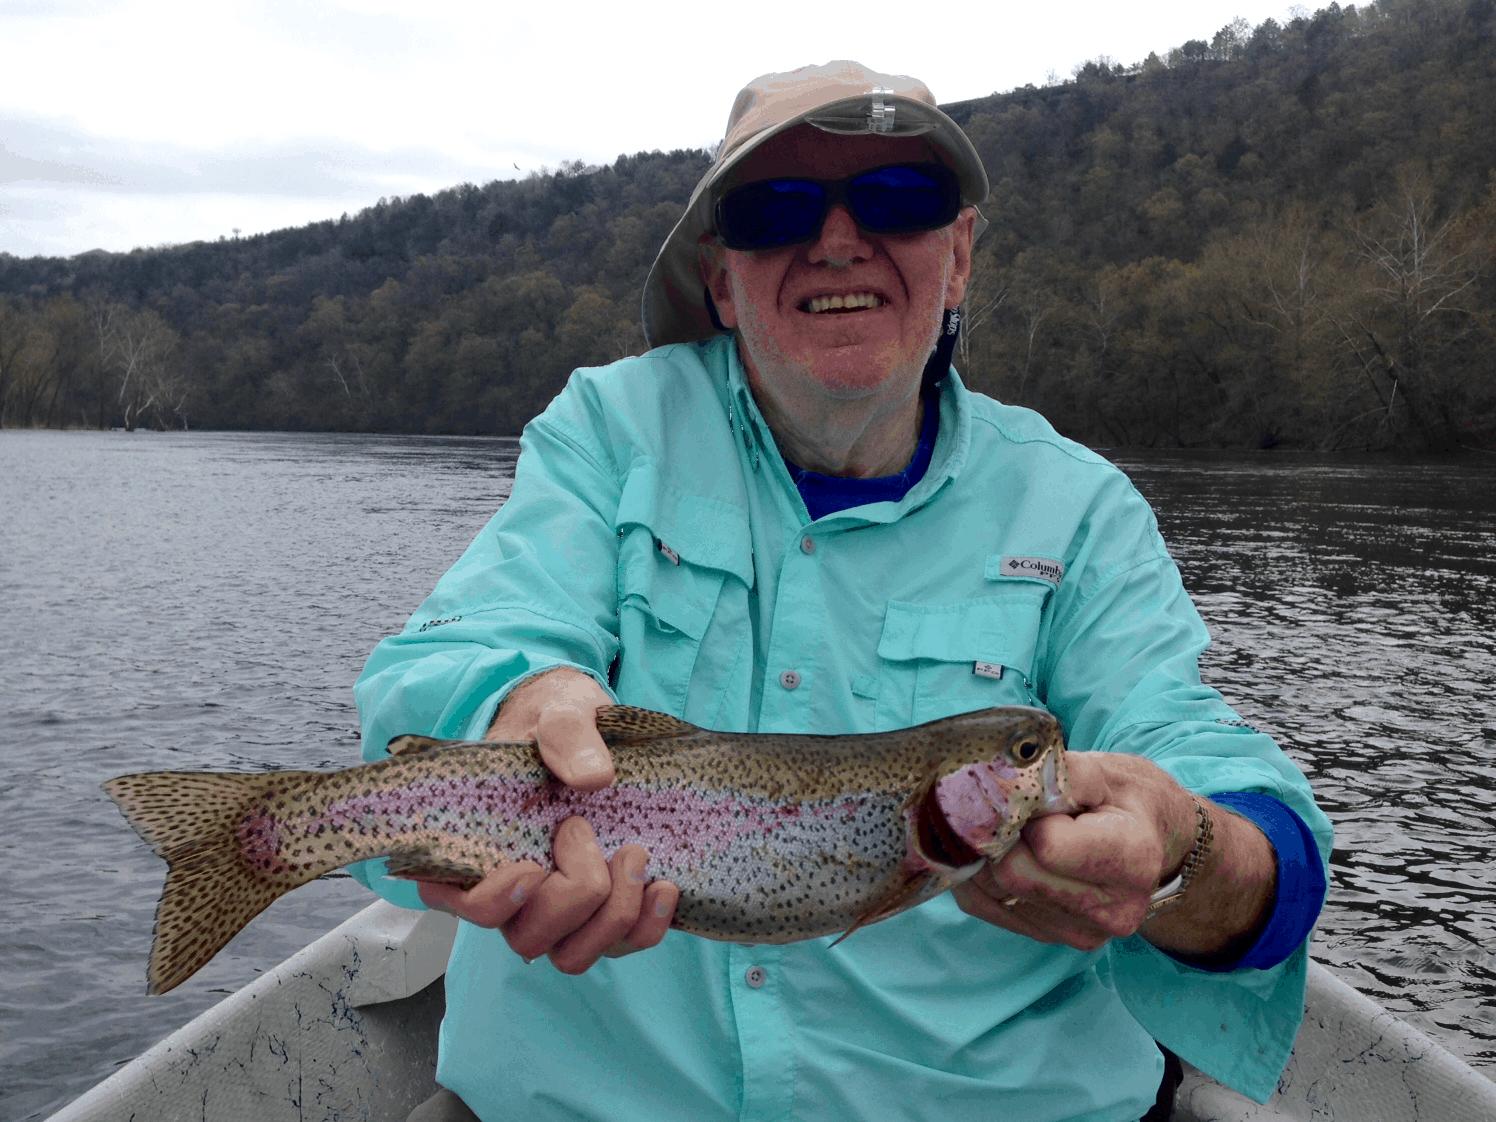 Fat fish branson trout fishing at river run outfitters for Branson trout fishing